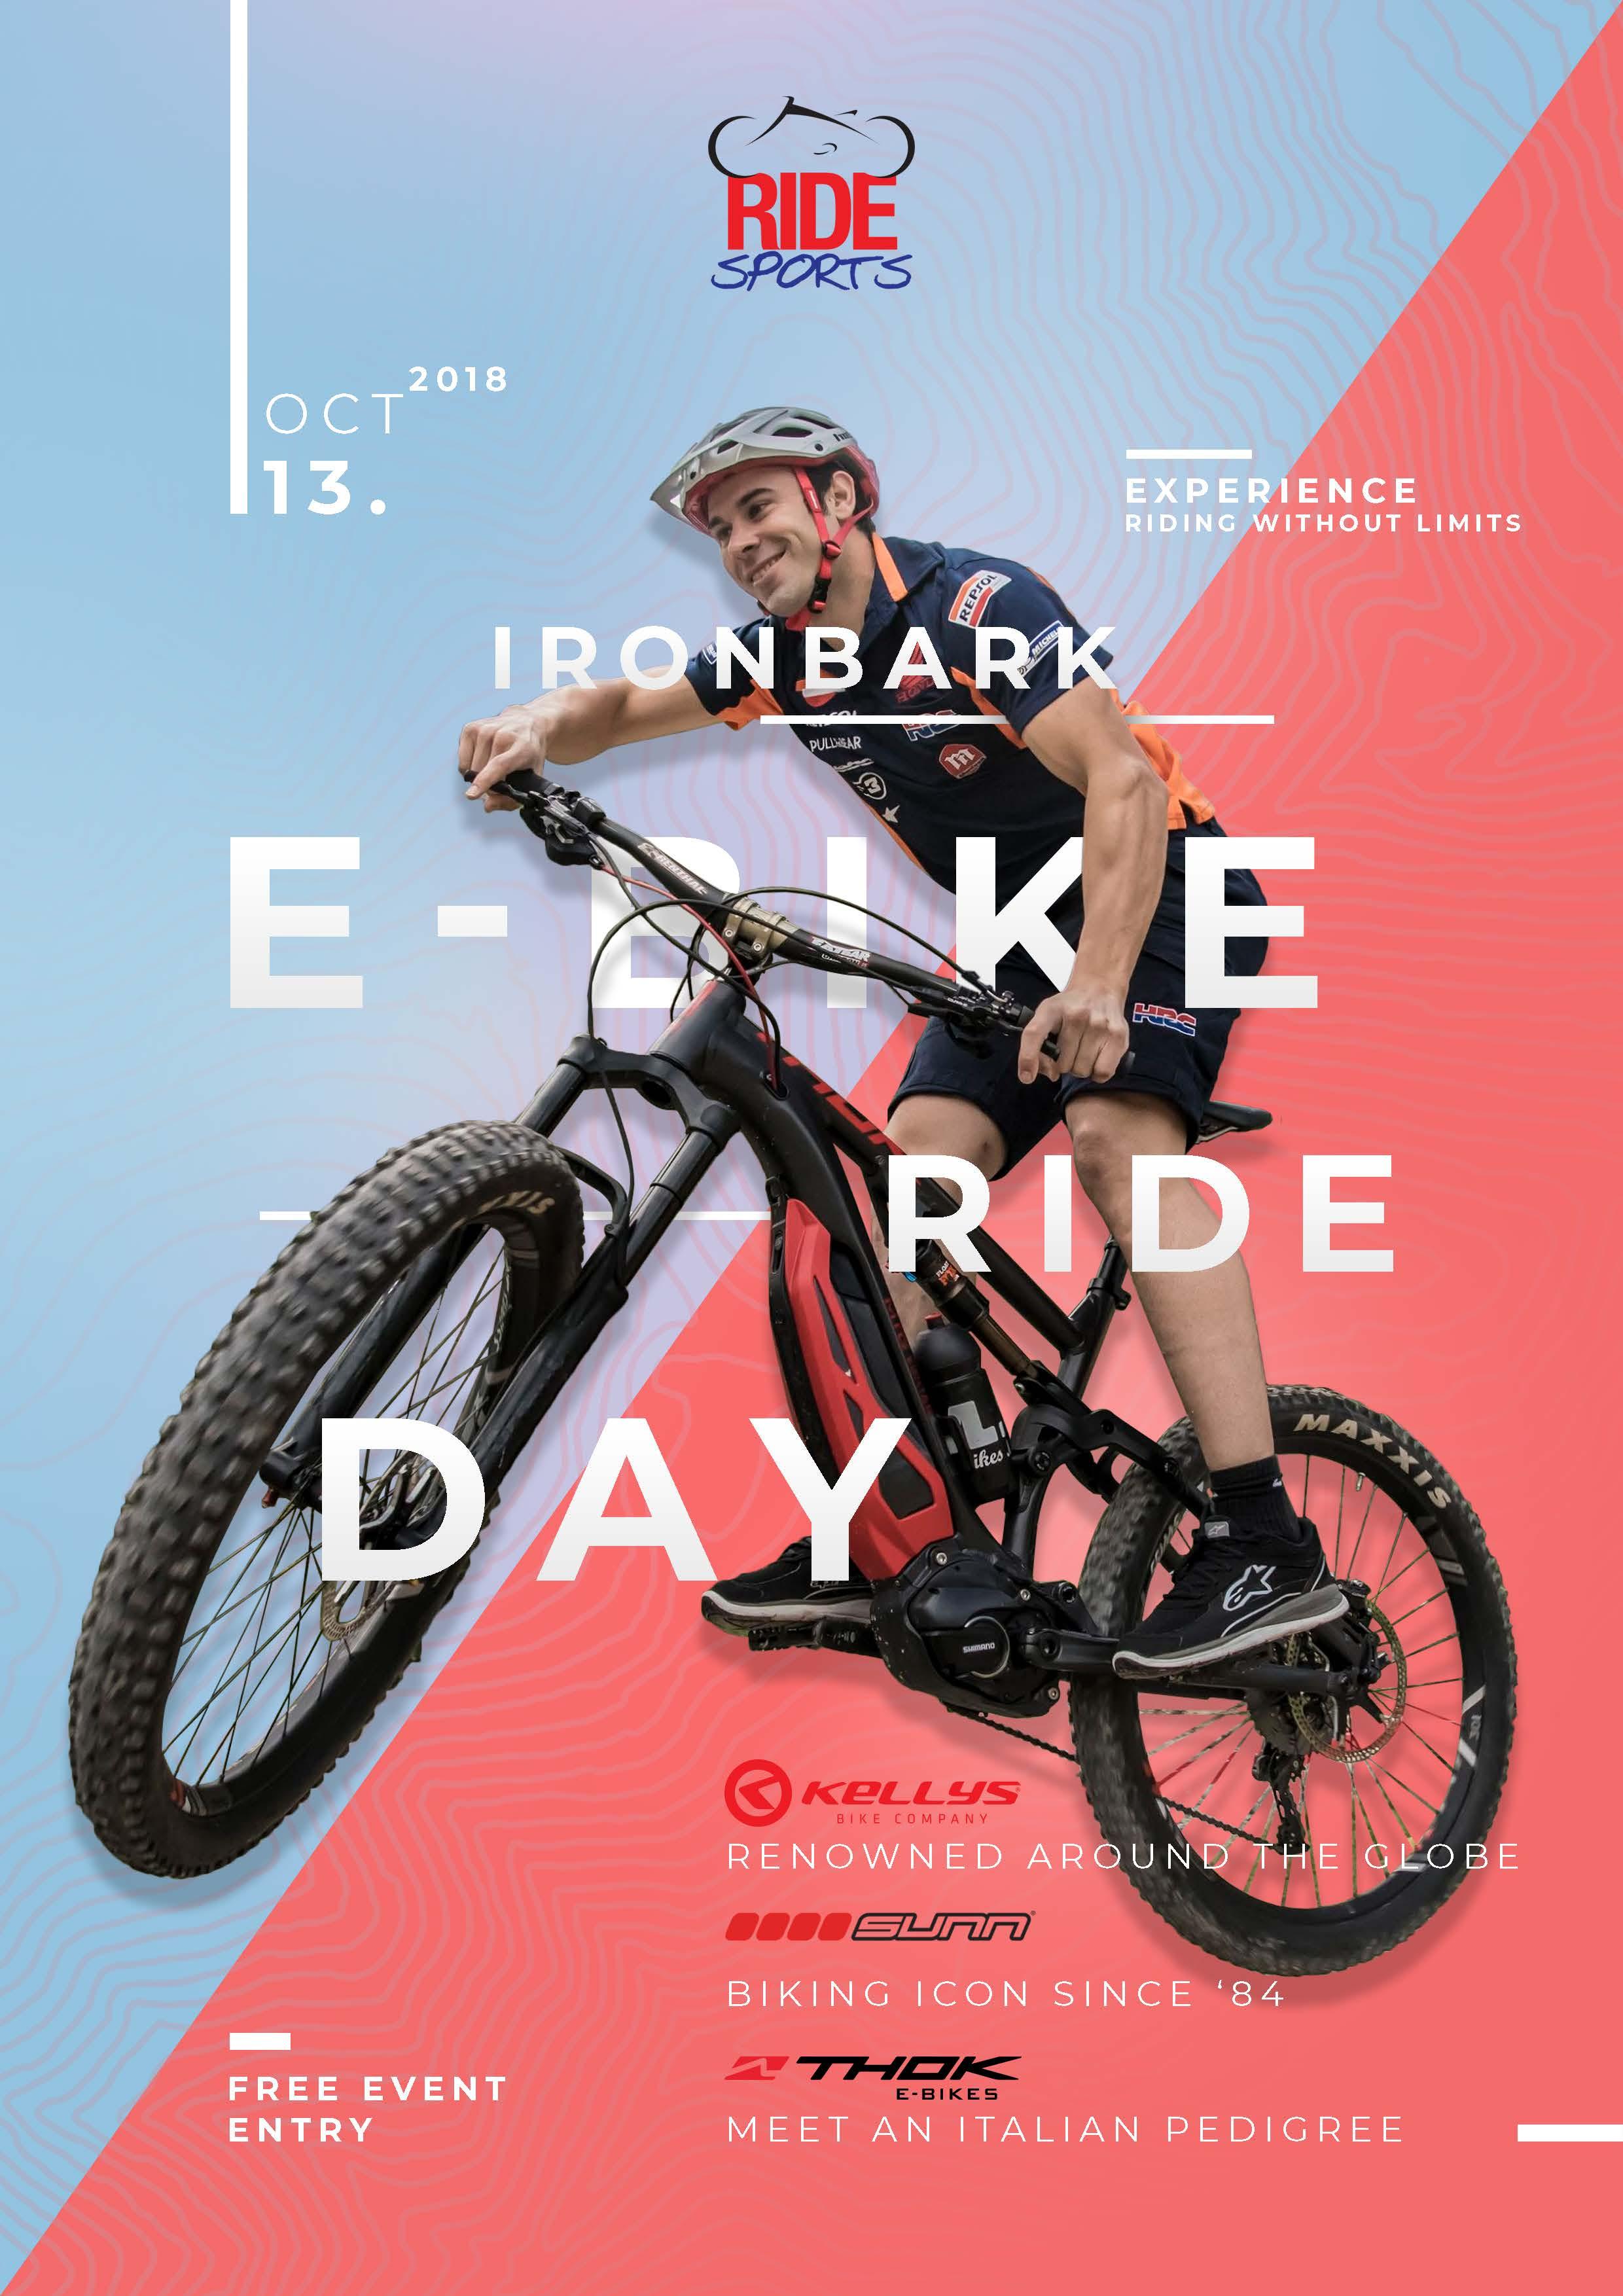 IRONBARK-Thok-Jumper-2018.jpg